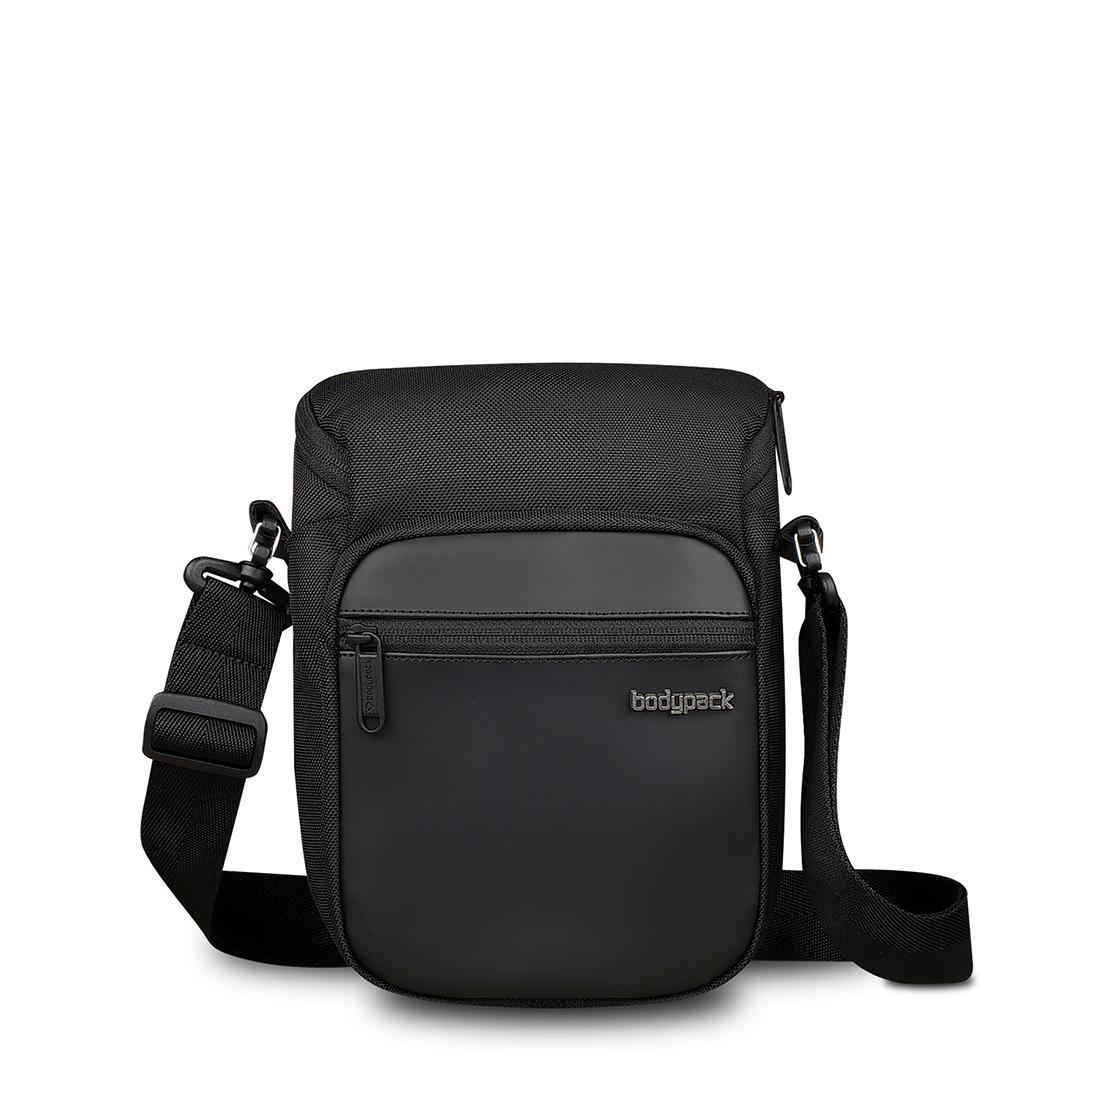 Bodypack Prodigers Berlin Black Coffee Daftar Harga Terkini 2820bftn Shuttle Travel Pouch